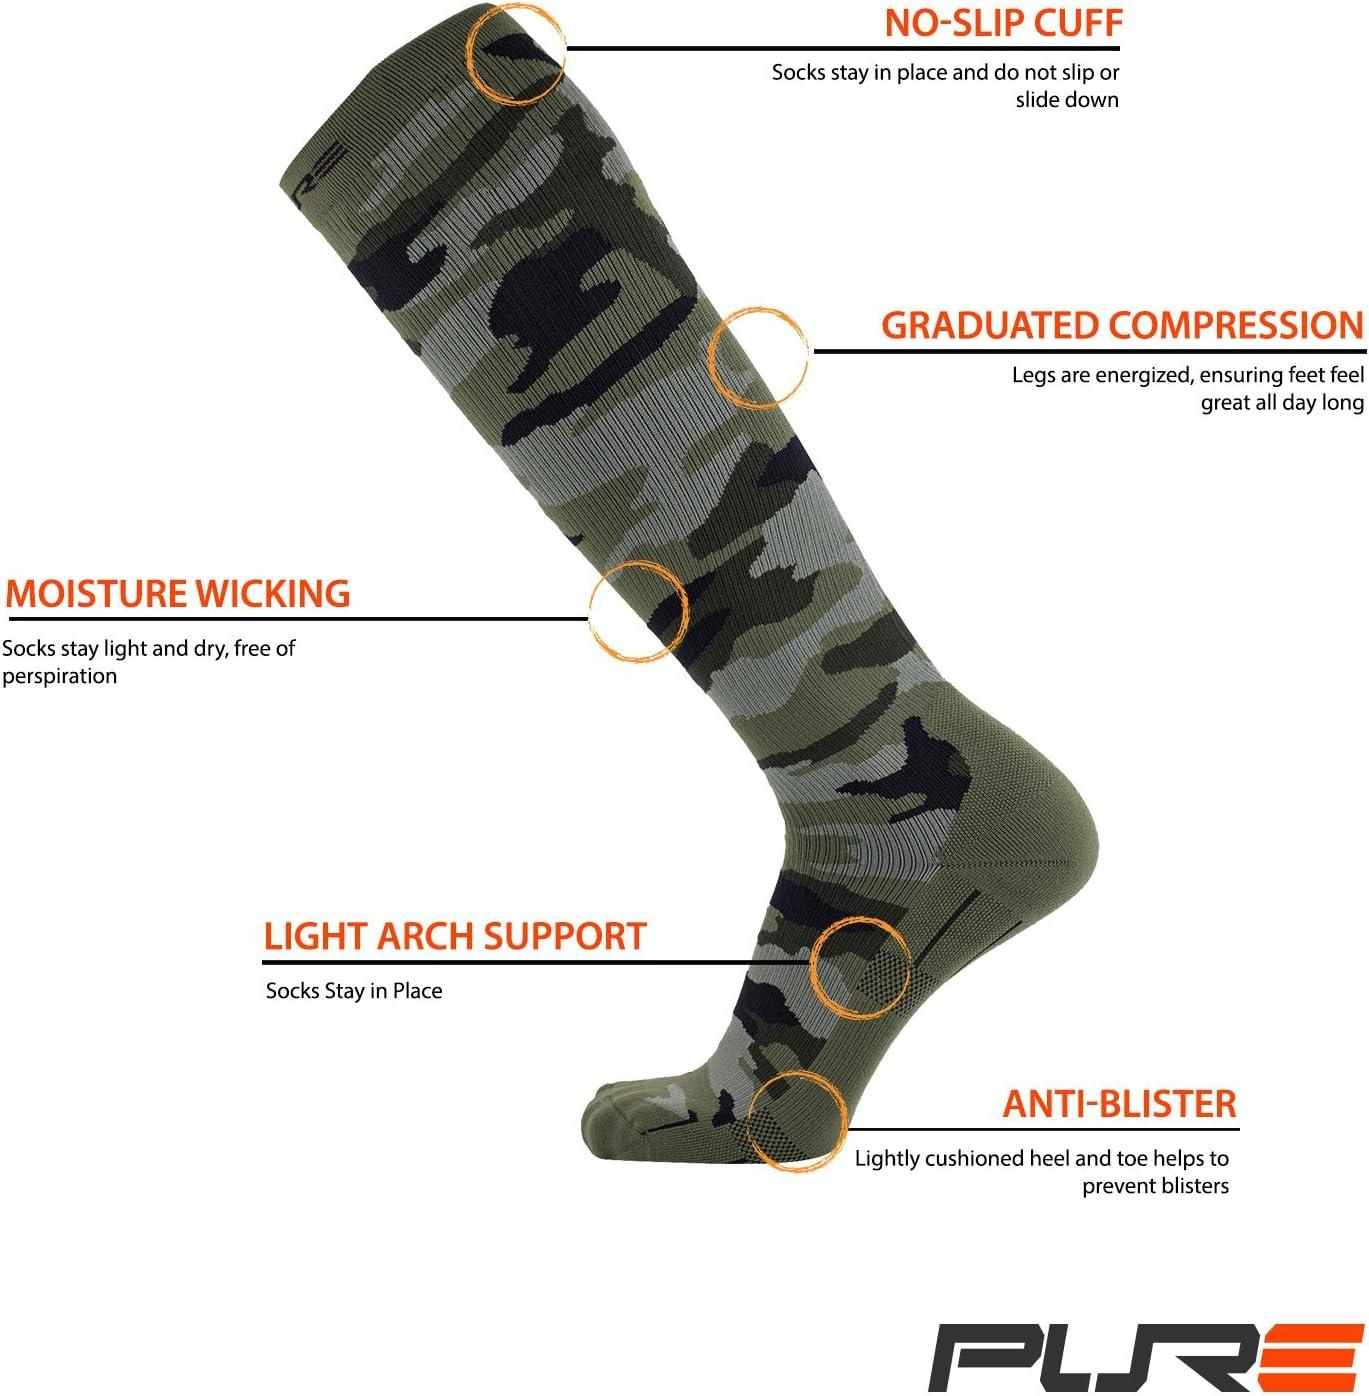 Women Camo Compression Socks for Men Best Graduated Compression Socks